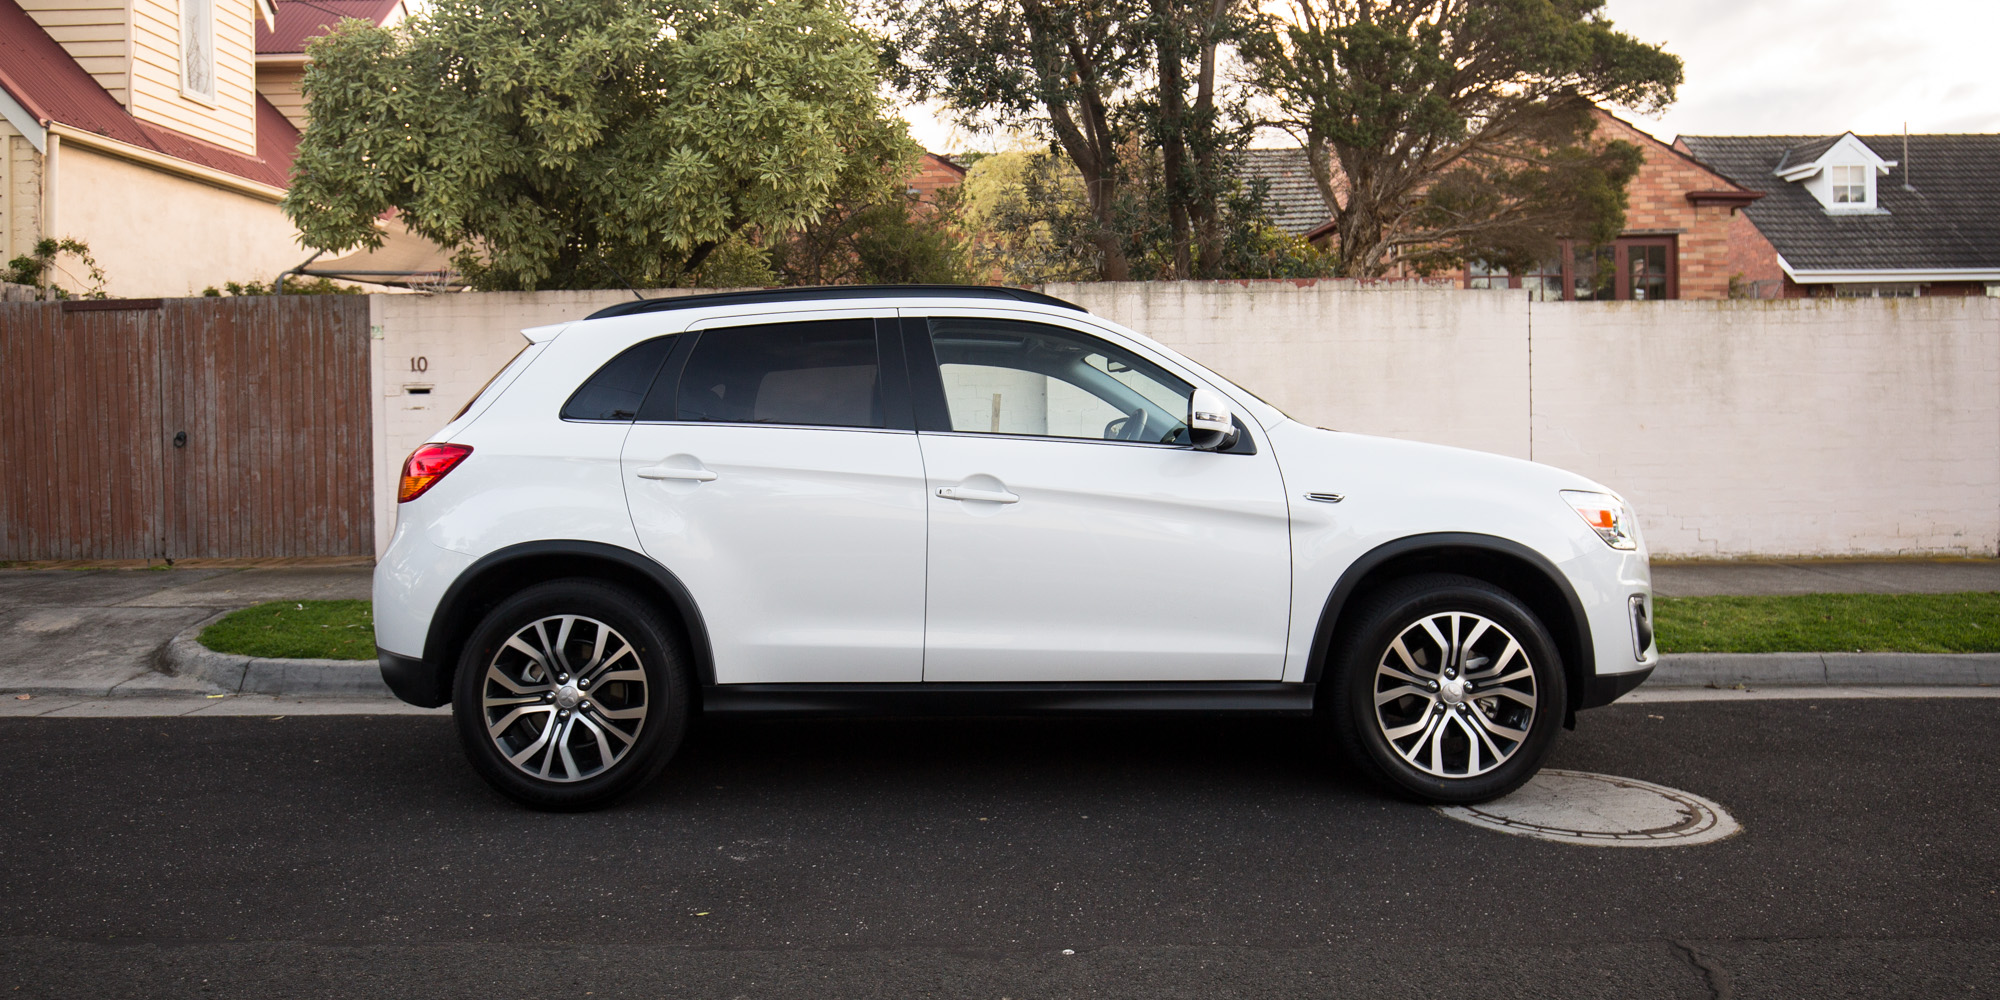 2015 Mitsubishi ASX XLS 4WD Review